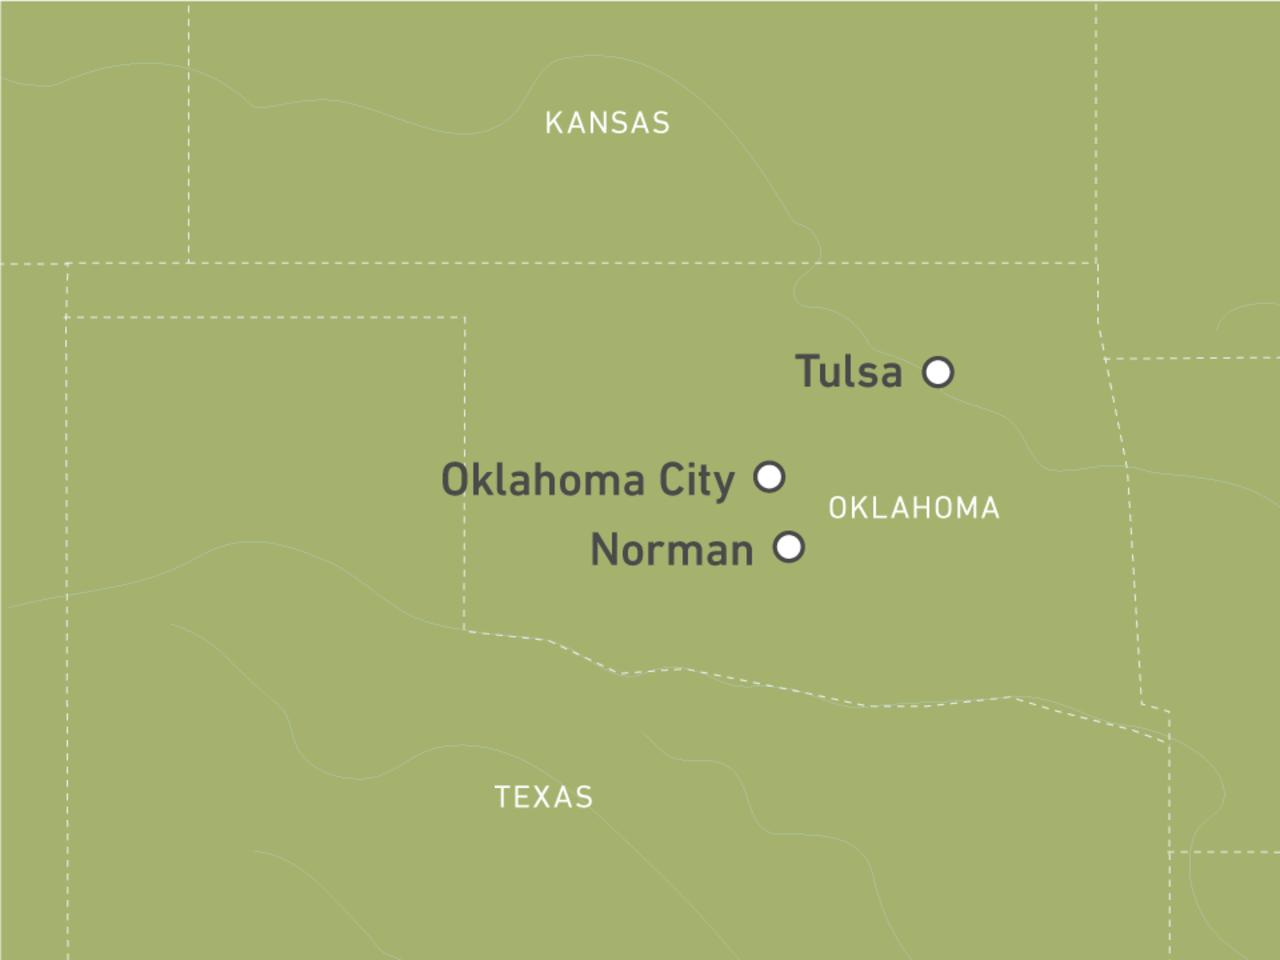 Oklahoma-Reisen: Entdecke den Mittleren-Westen! | CANUSA